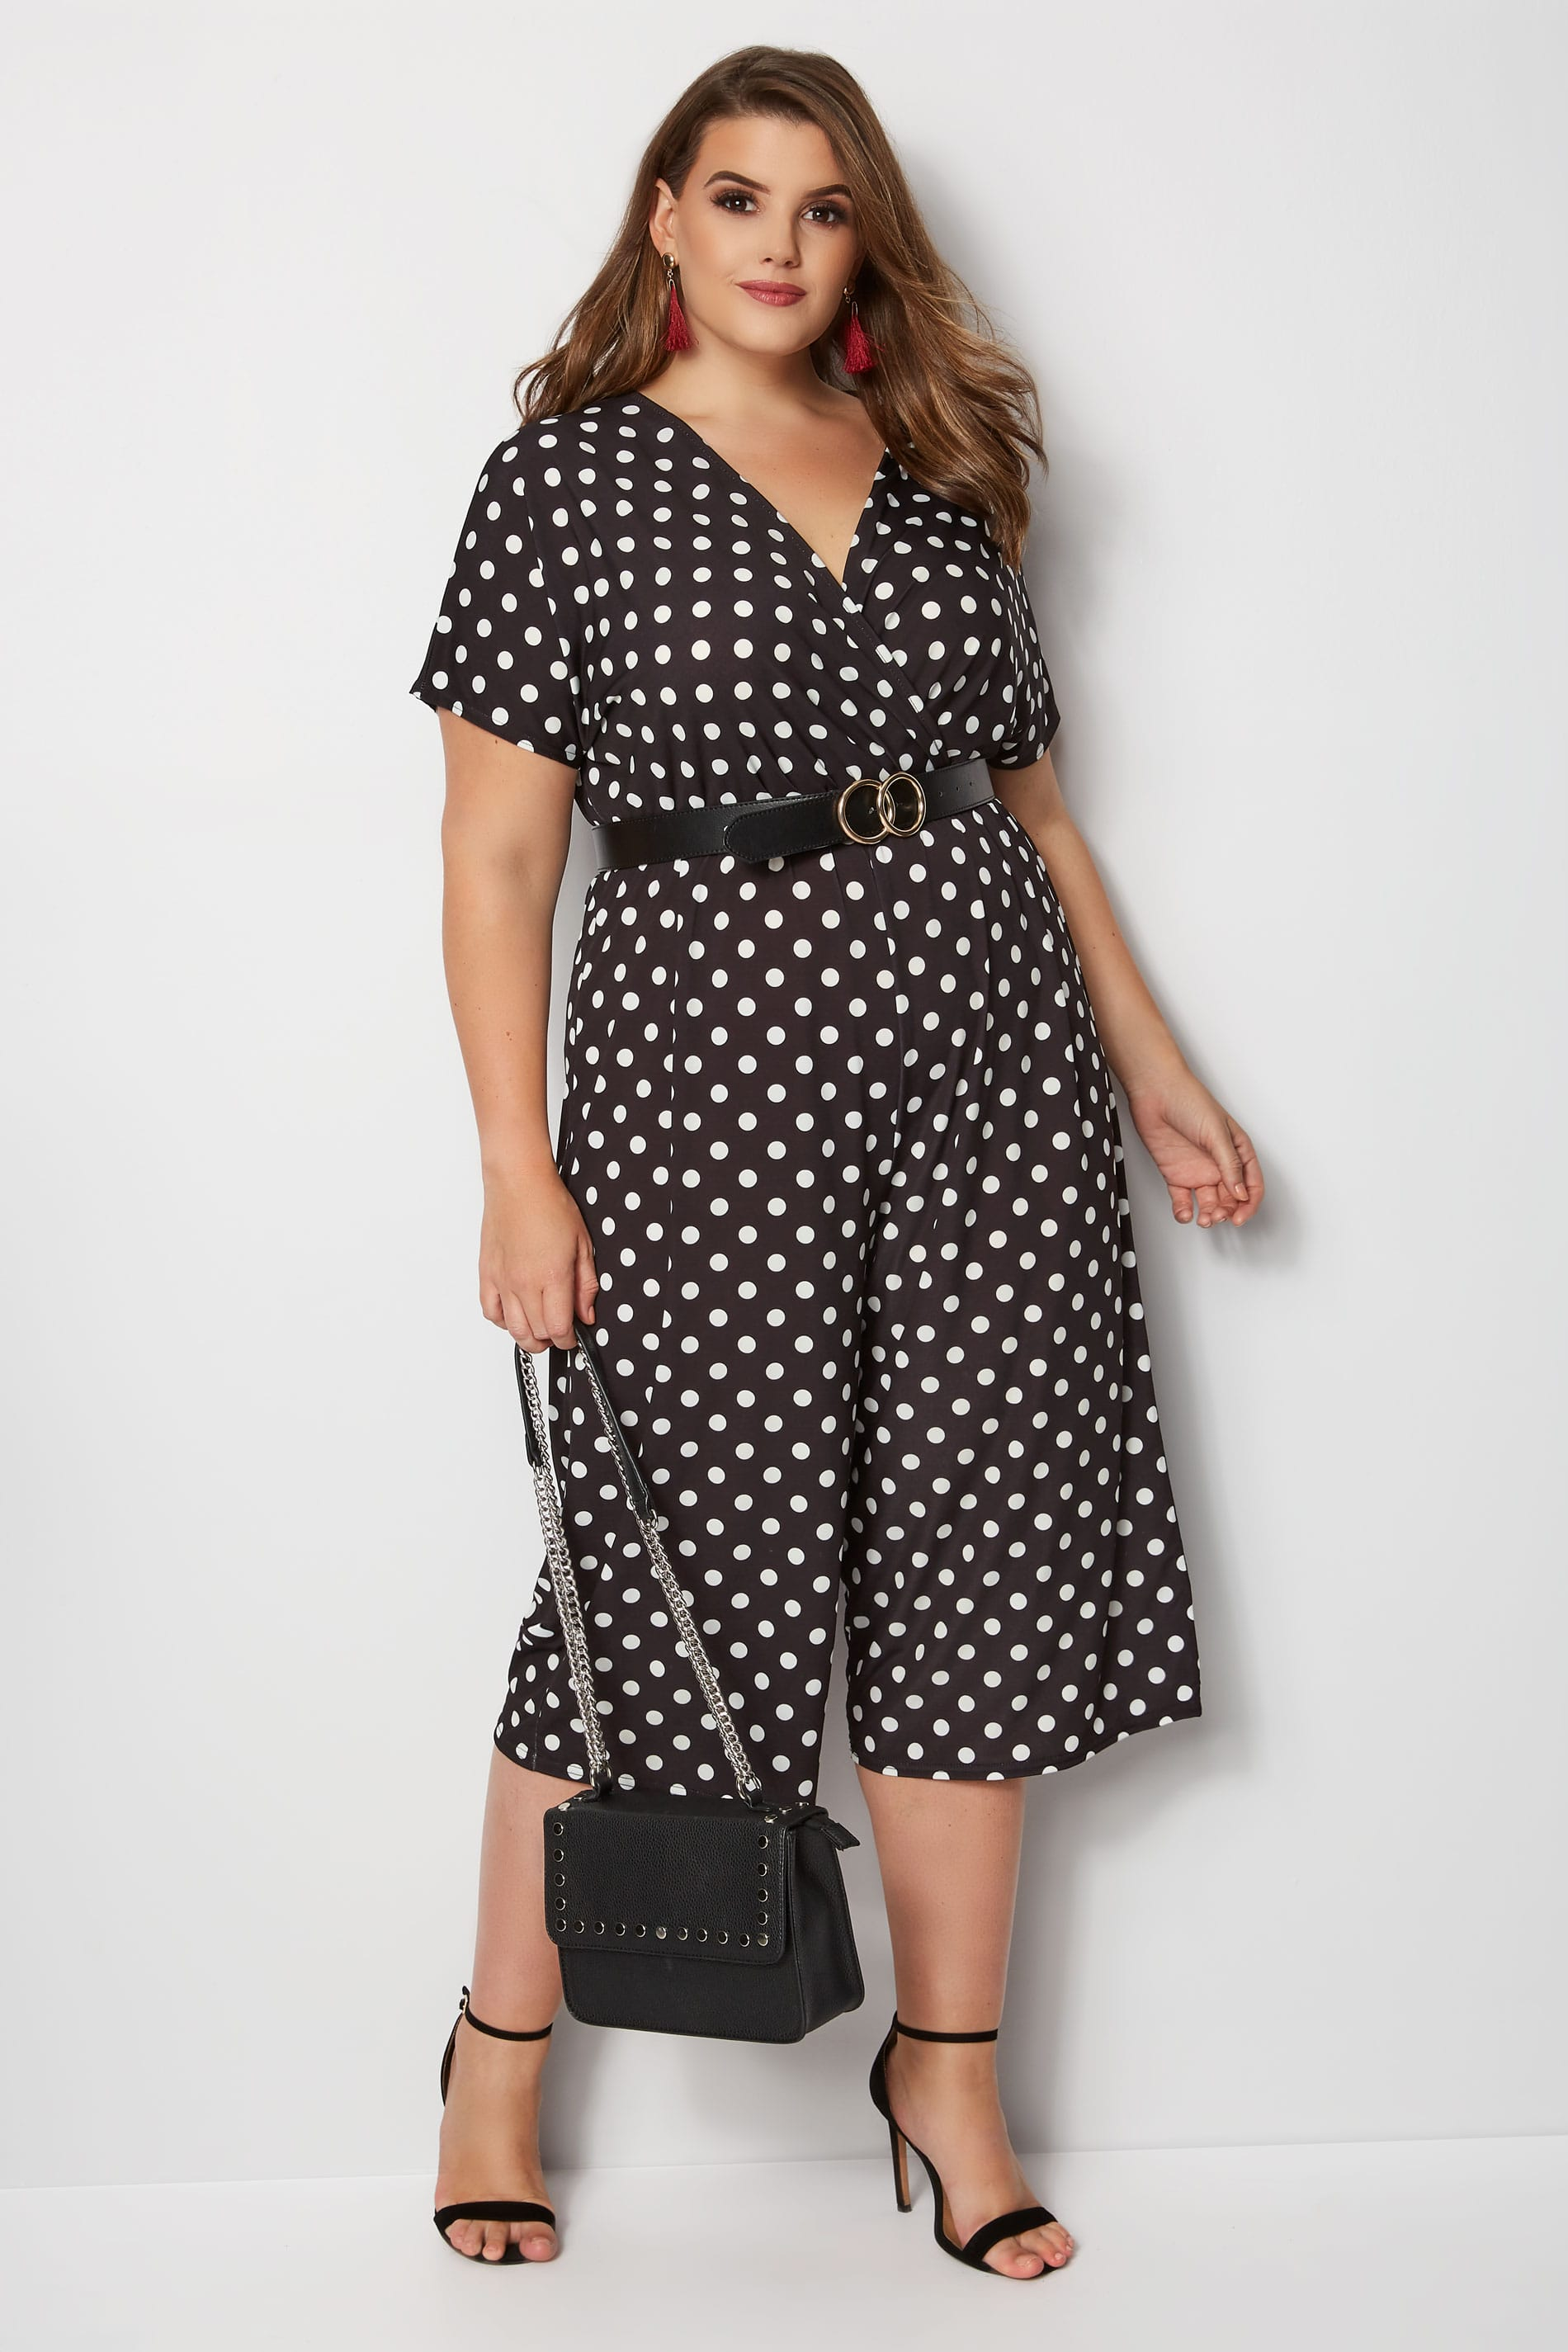 YOURS LONDON Black & White Polka Dot Jumpsuit